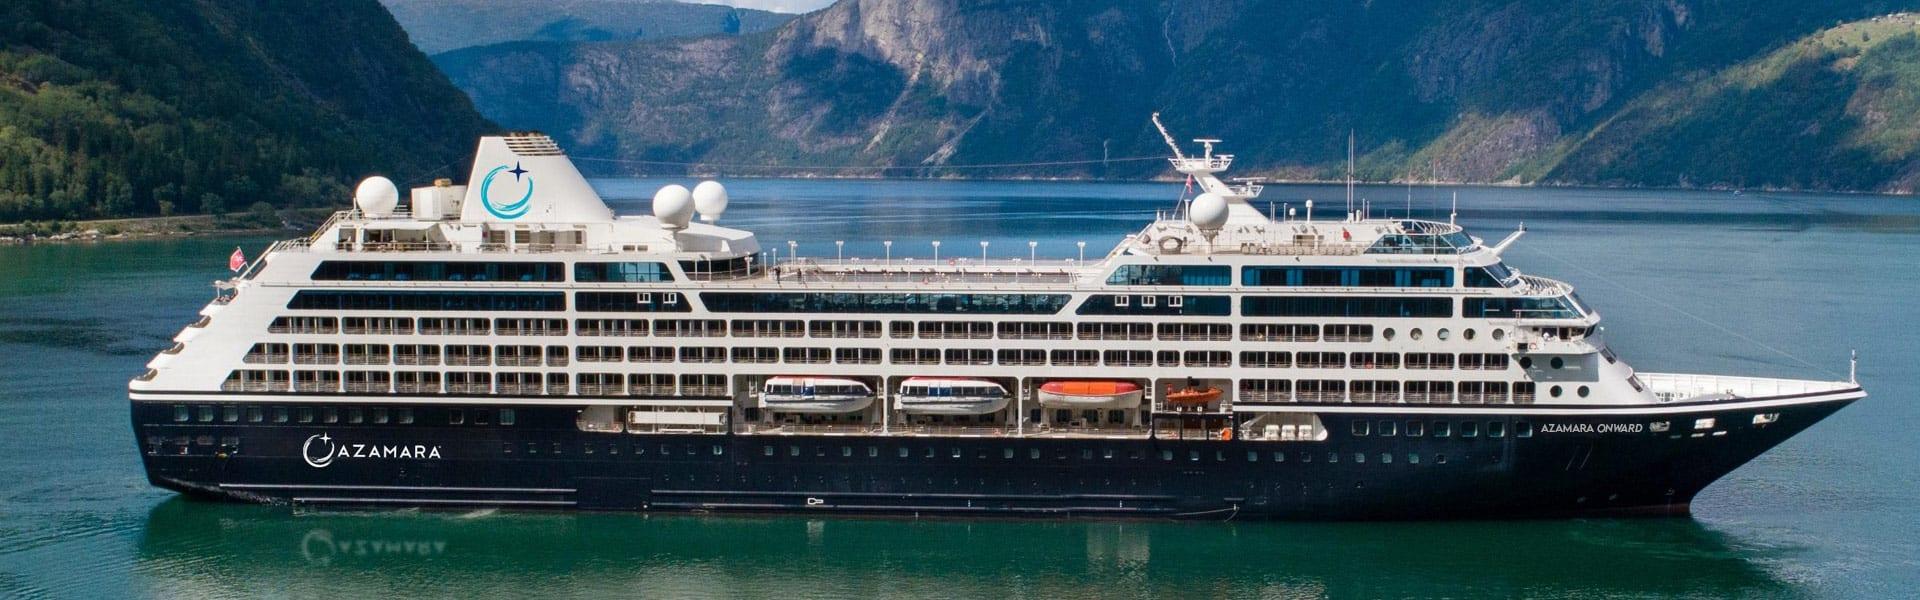 Azamara Onward at sea